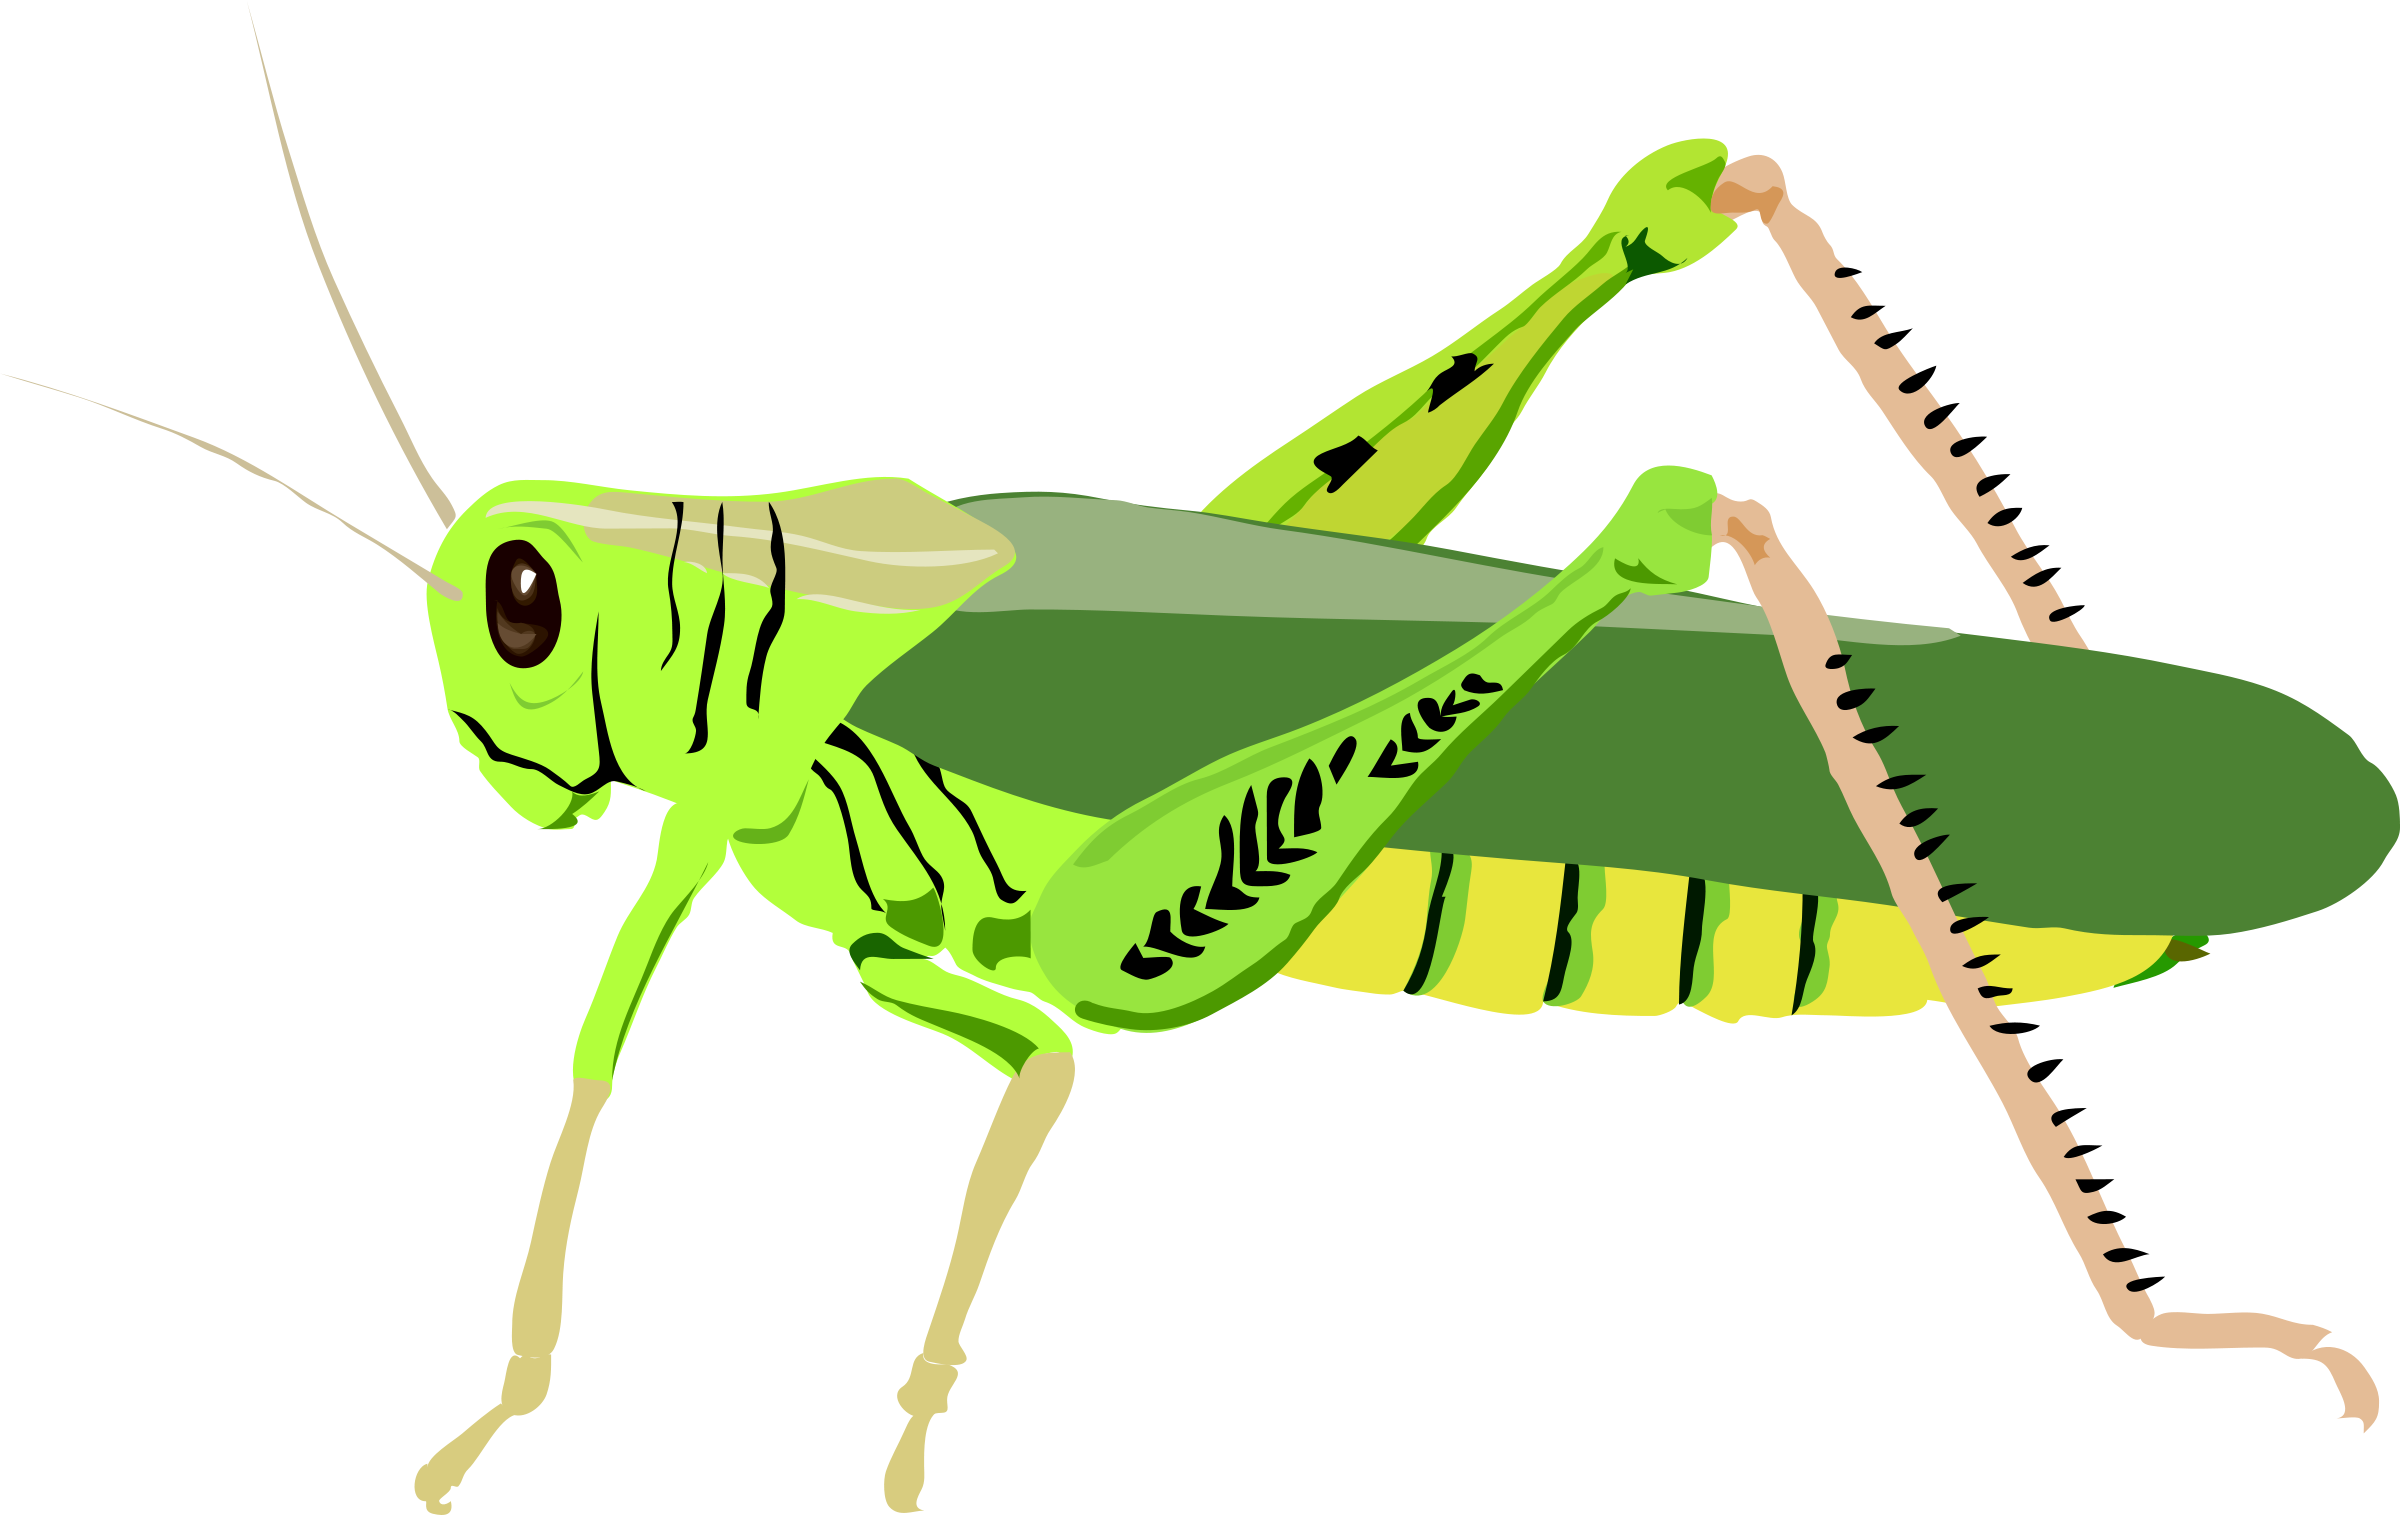 Grasshopper clipart sketch. Images panda free clip